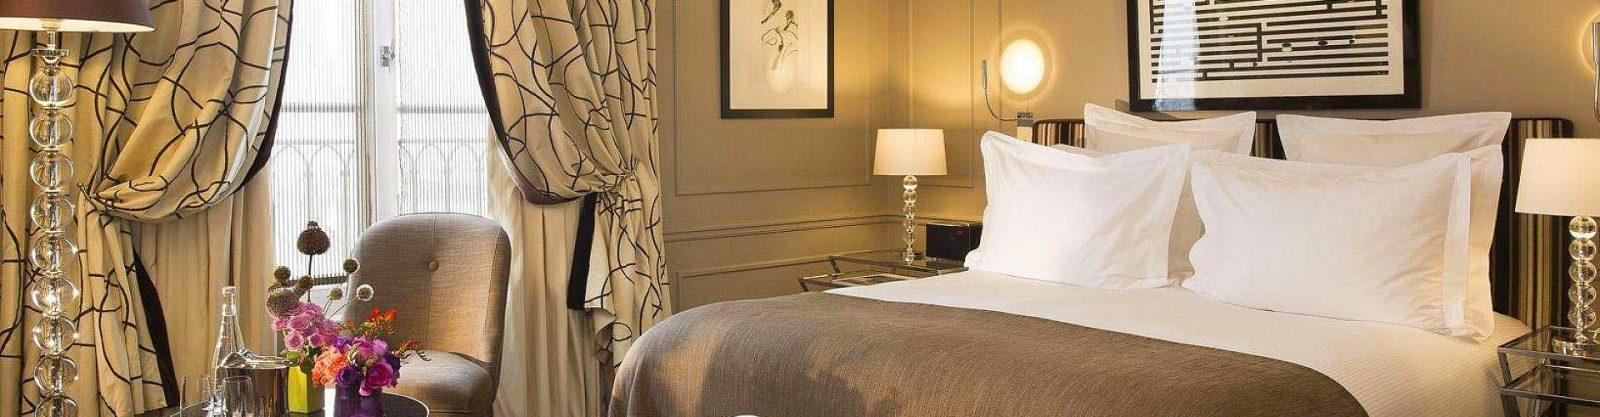 header hotel privatif paris le burgundy